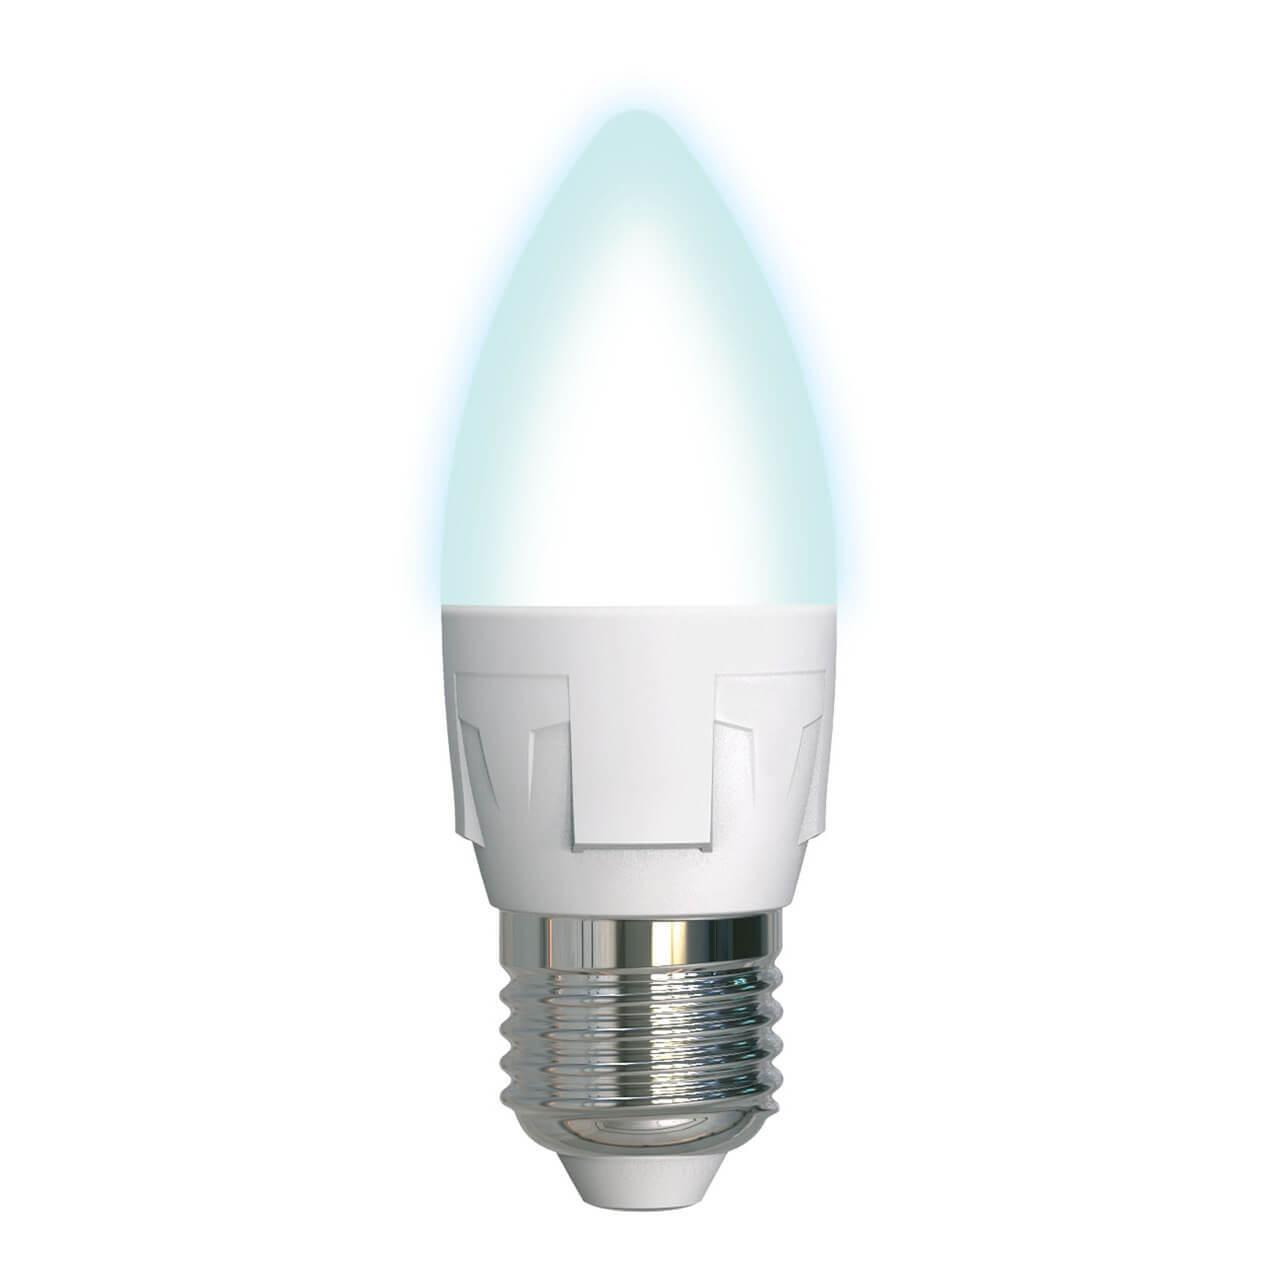 Лампочка Uniel LED-C37 7W/NW/E27/FR PLP01WH Яркая упаковка светодиодных ламп 10 шт uniel led nw fr plp01wh картон e27 a60 10вт